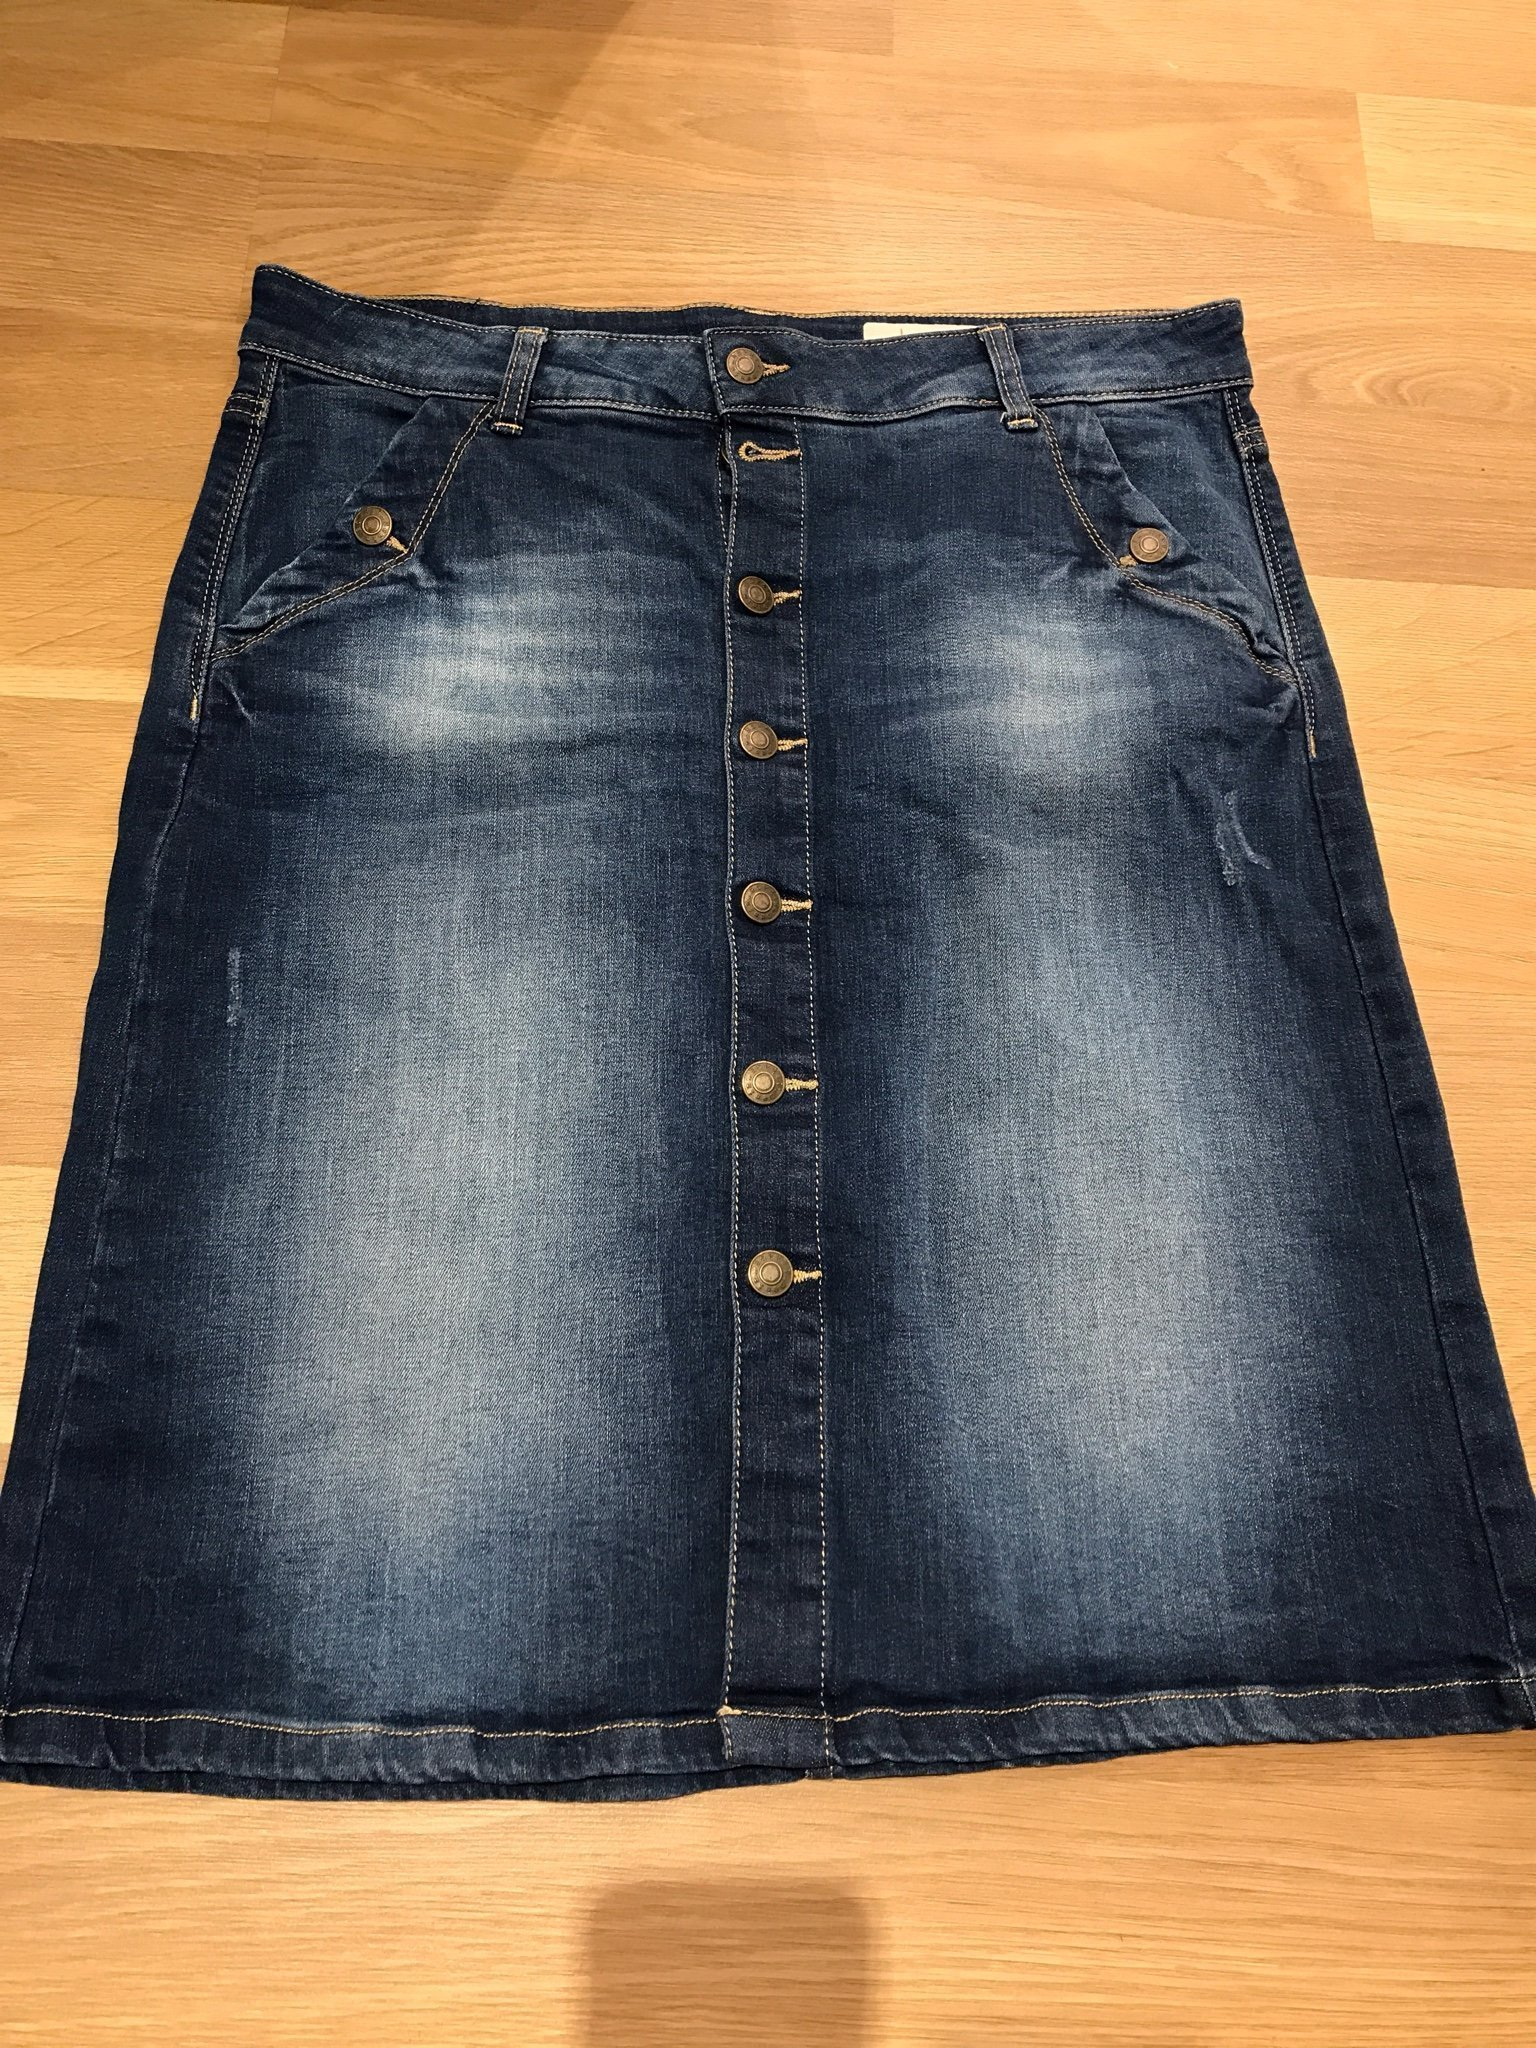 e5b356e029 jeans kjol Esprit stl 29 (38, M) (354486418) ᐈ Köp på Tradera